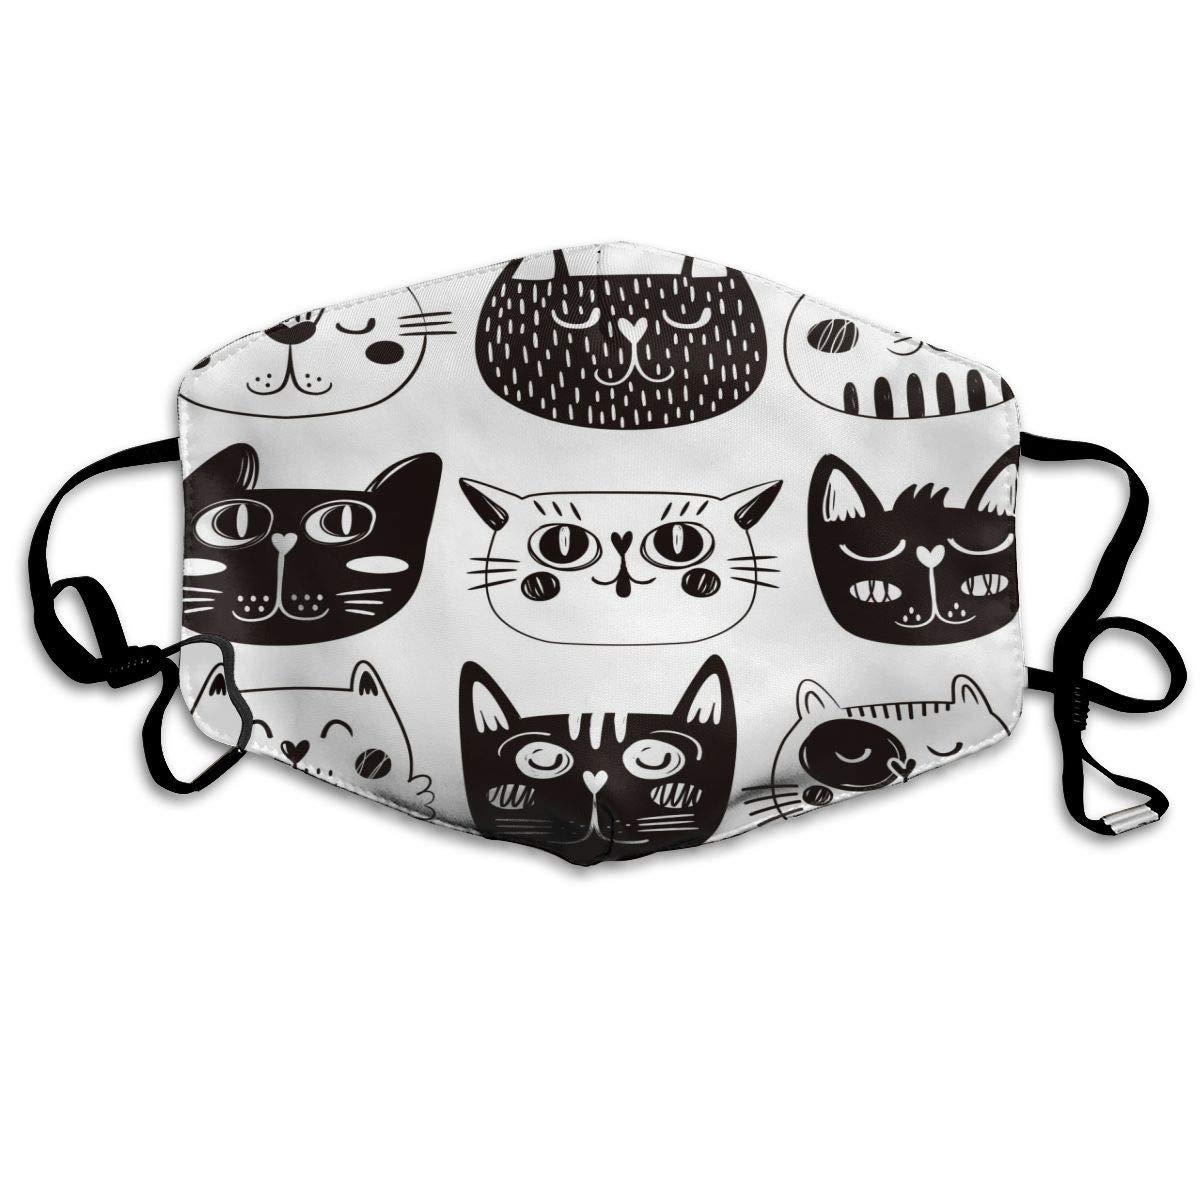 Black And White Cartoon Cat Faces Breathable 3d Tube Seamless Durable Face Bandana